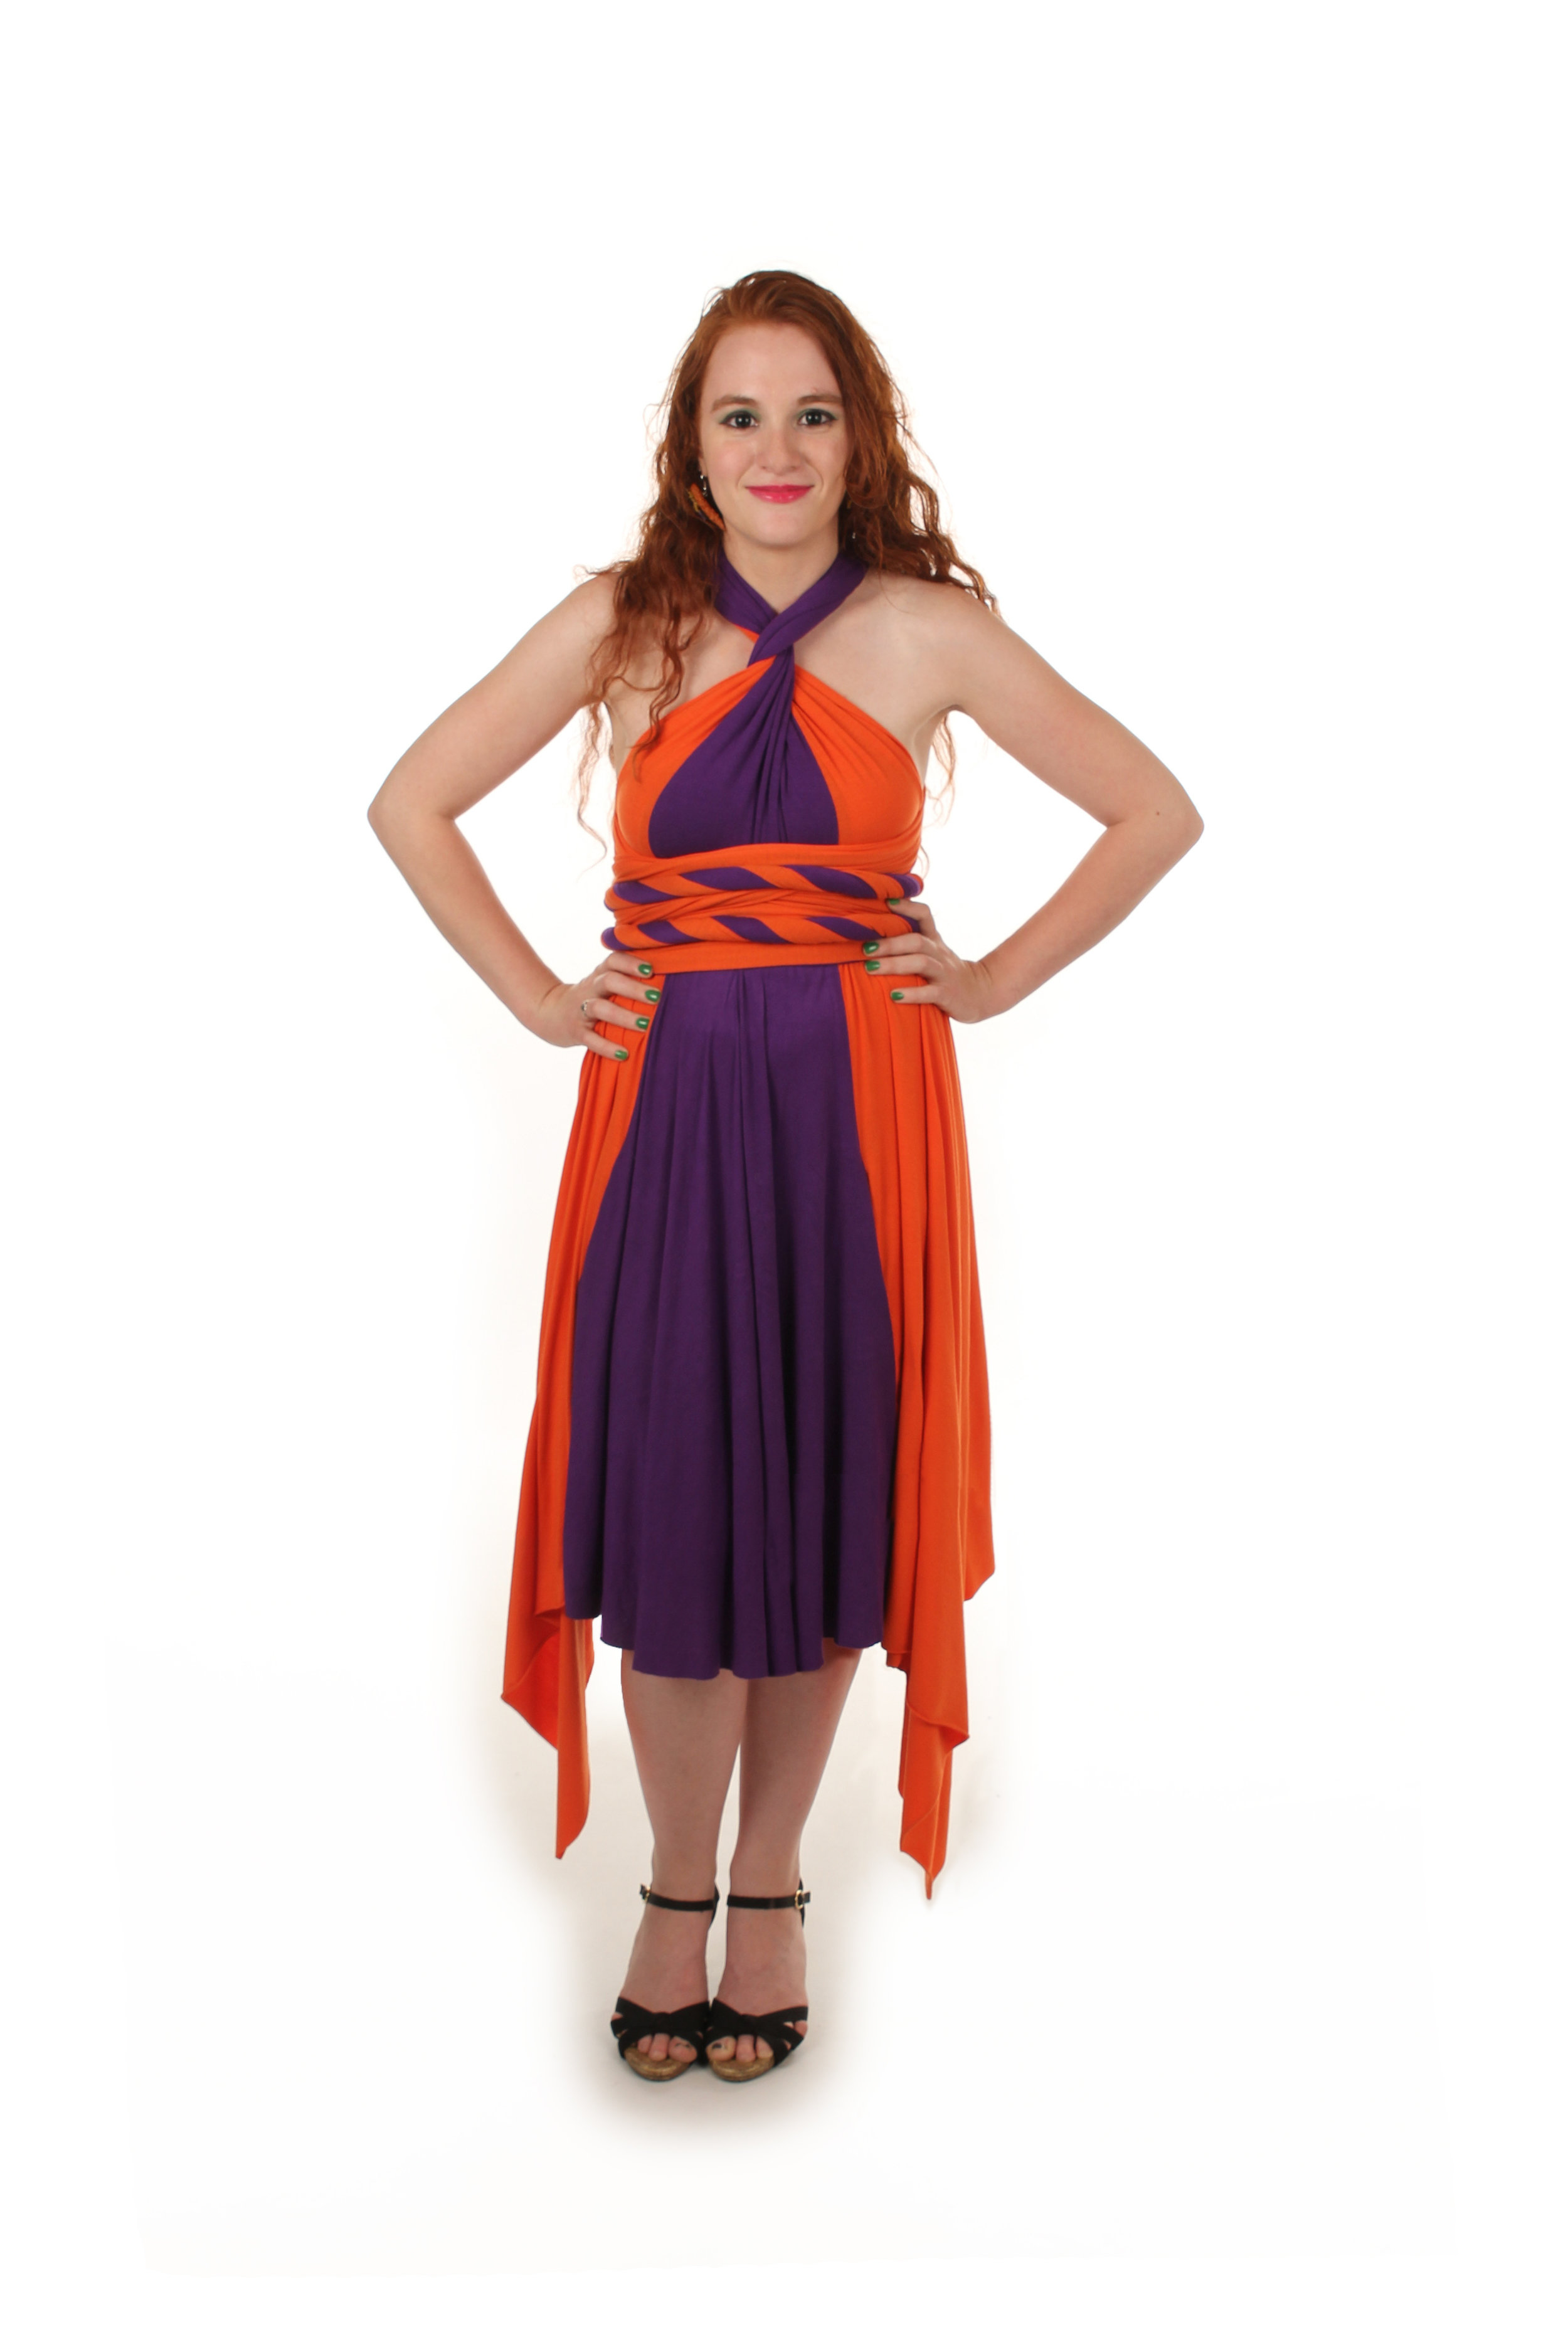 Radiation Superhero Inspired Convertible Dress